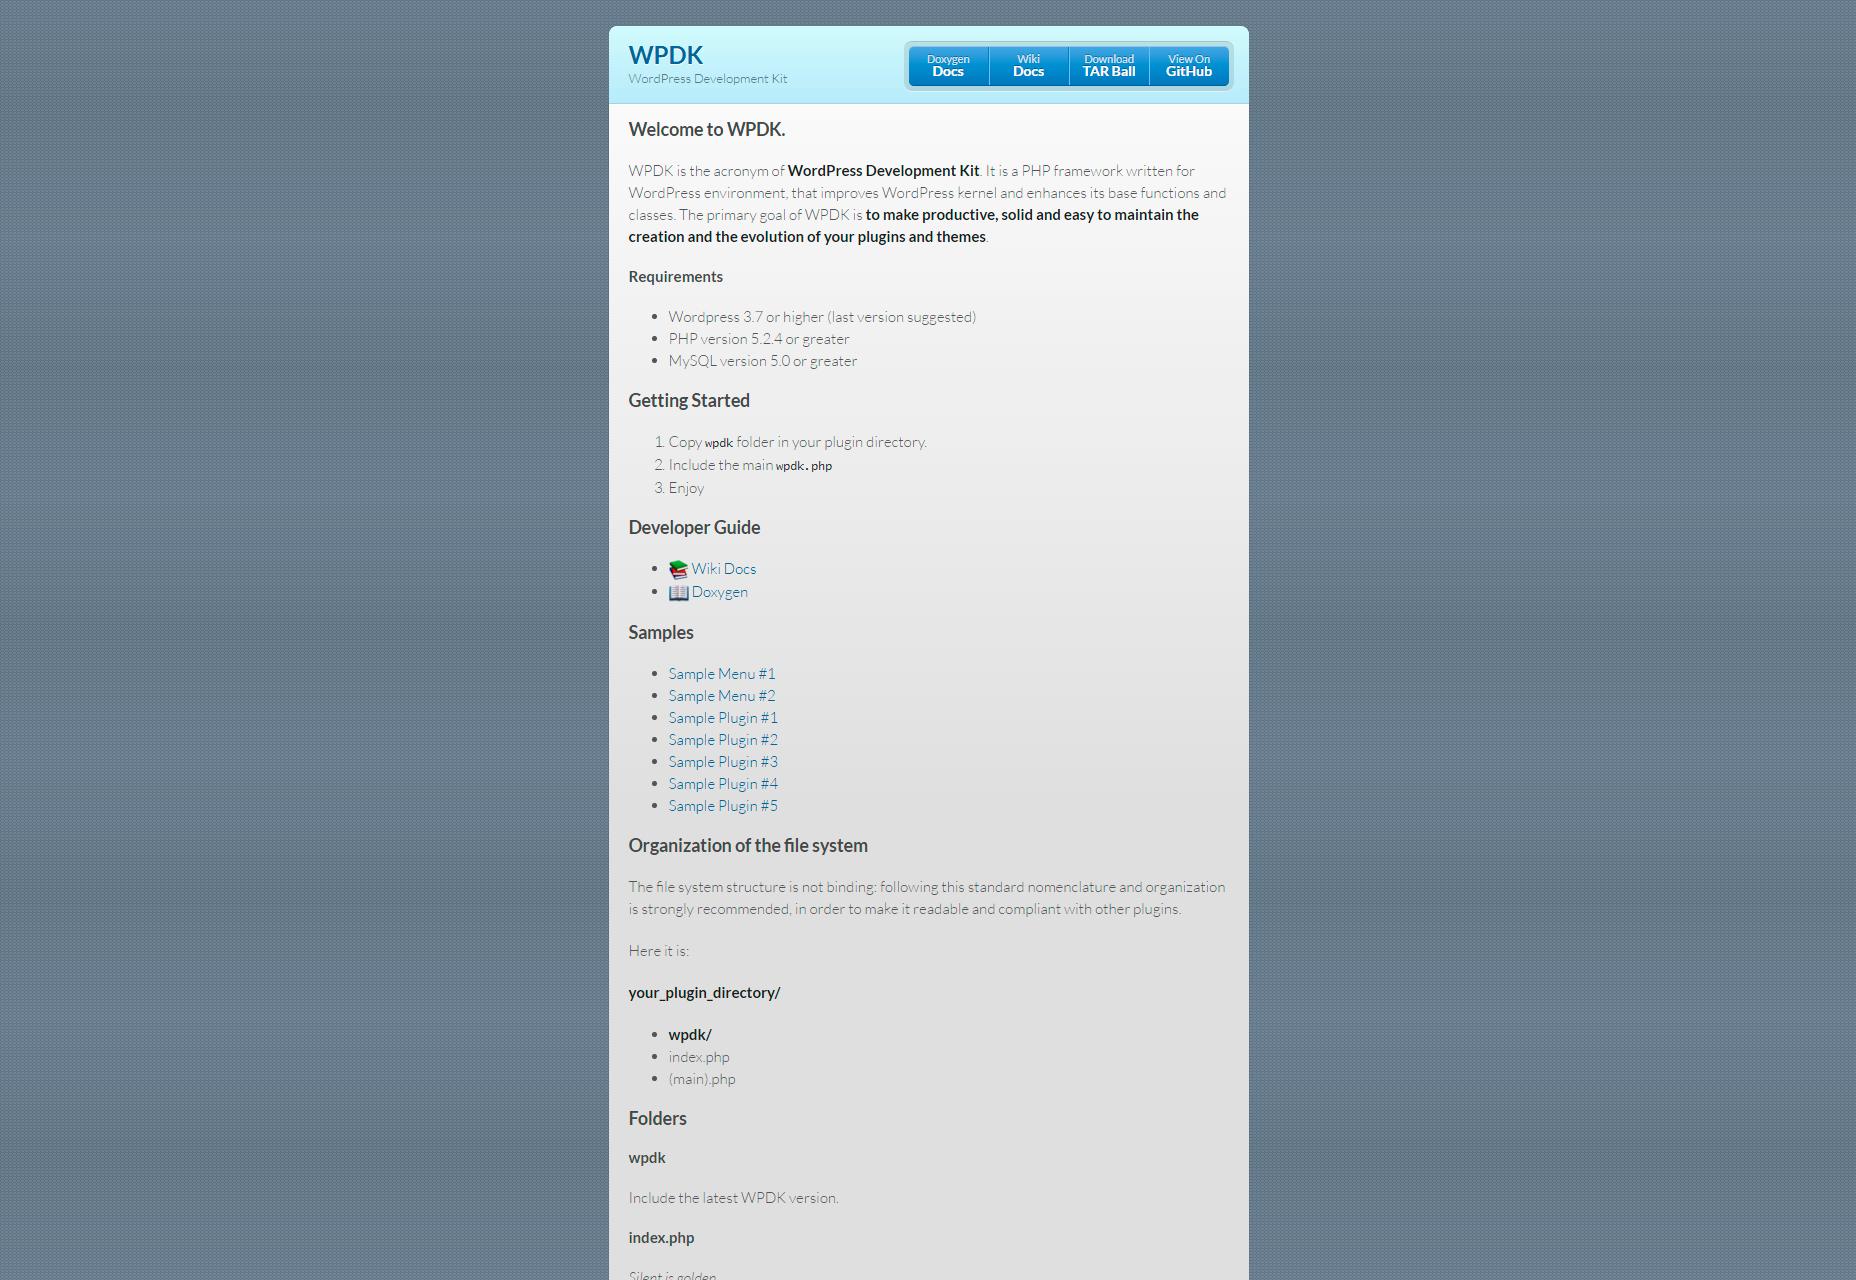 wpdk-wordpress-development-kit